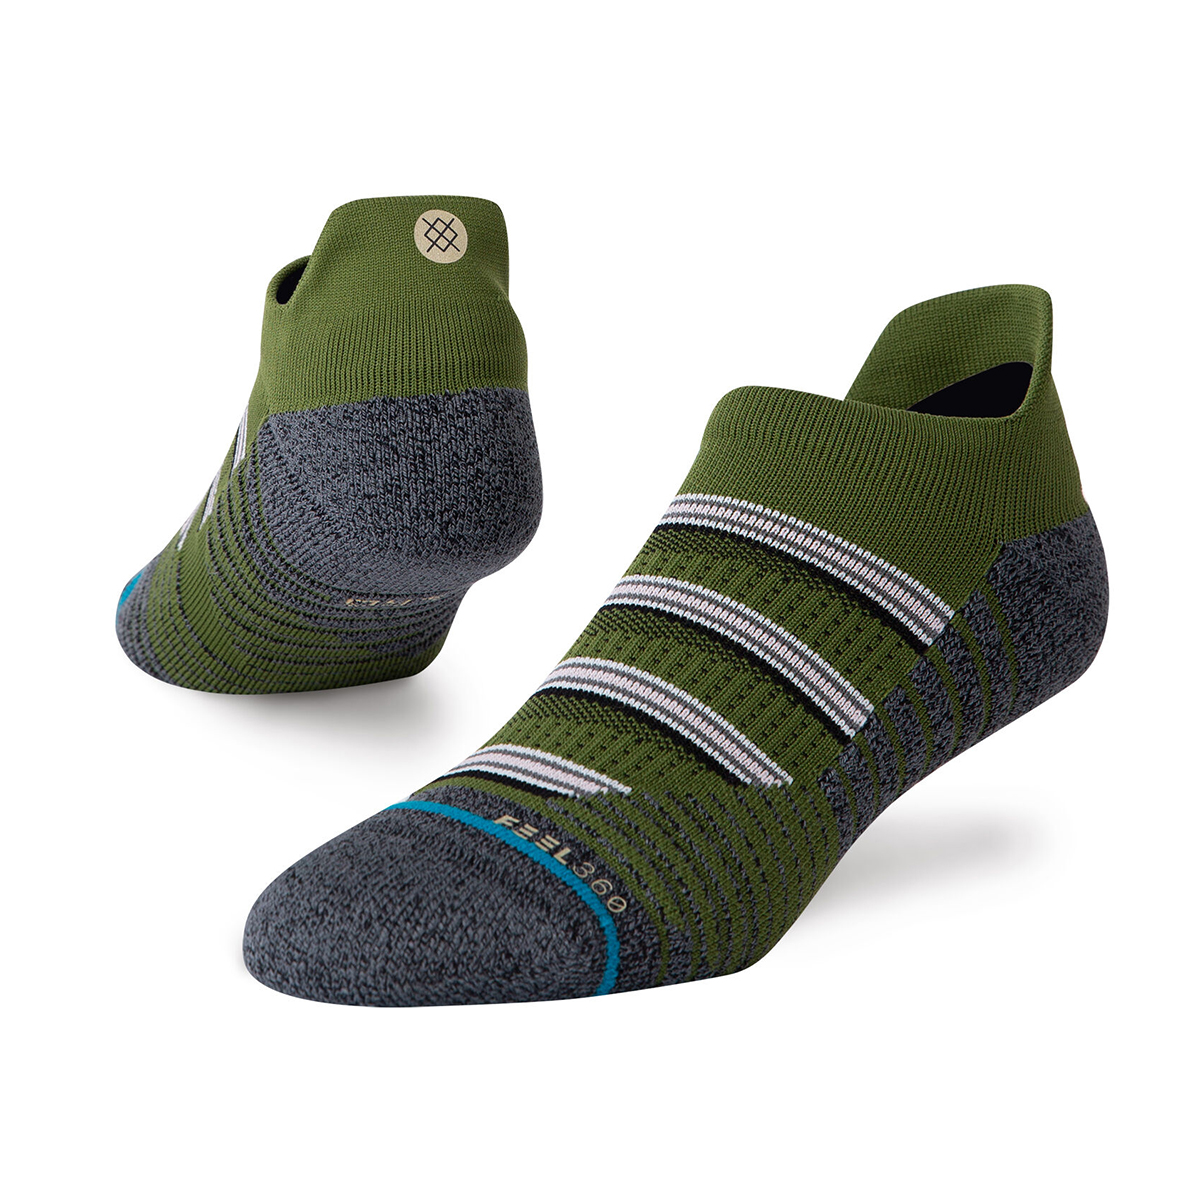 Men's Stance Combat Tab Socks - Color: Green - Size: M, Green, large, image 1